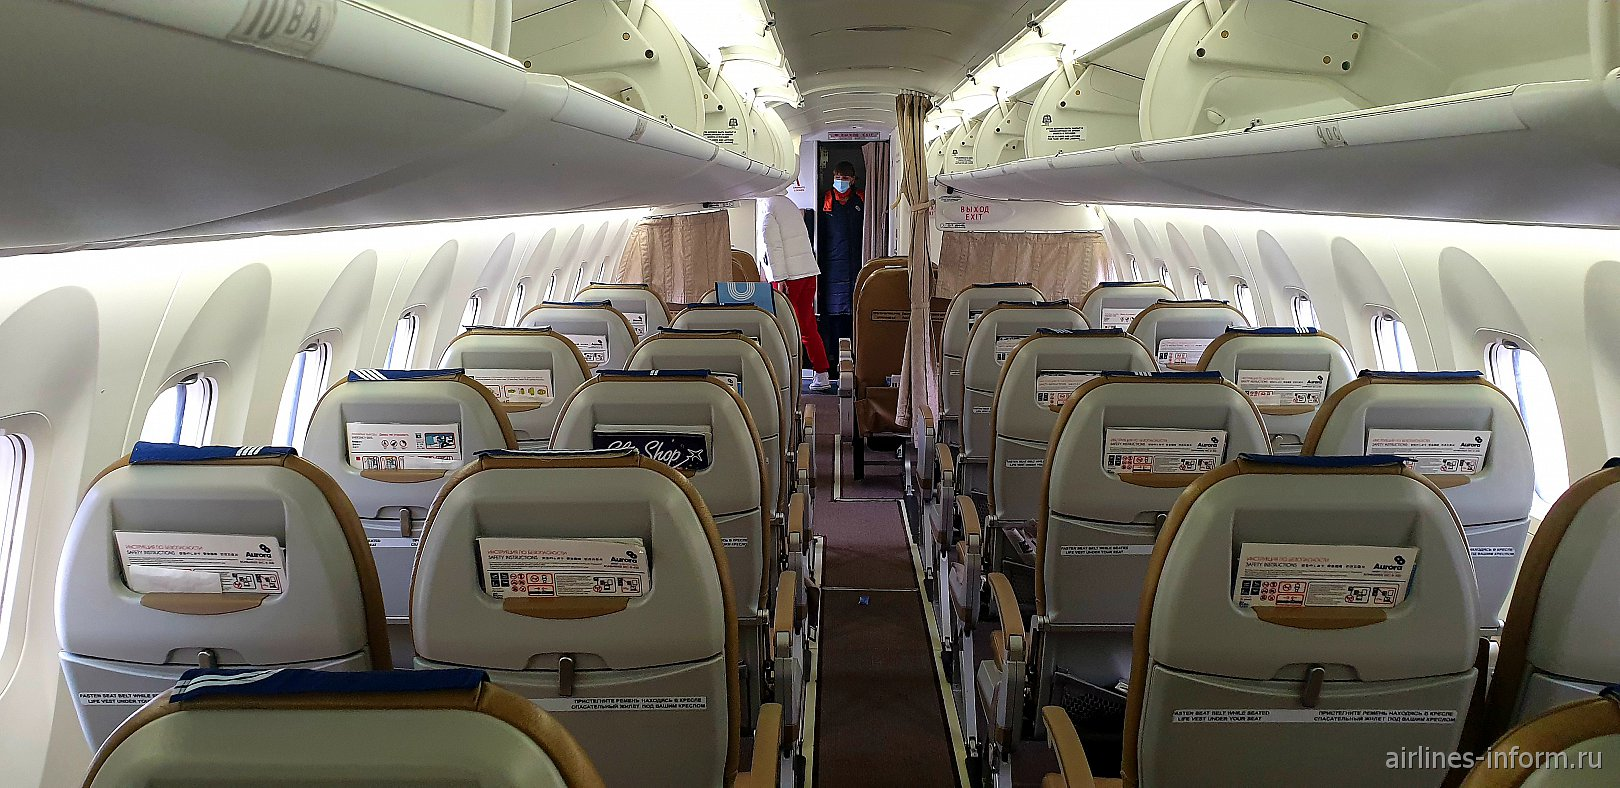 "Пассажирский салон самолета Bombardier Dash 8 Q400 авиакомпании ""Аврора"""